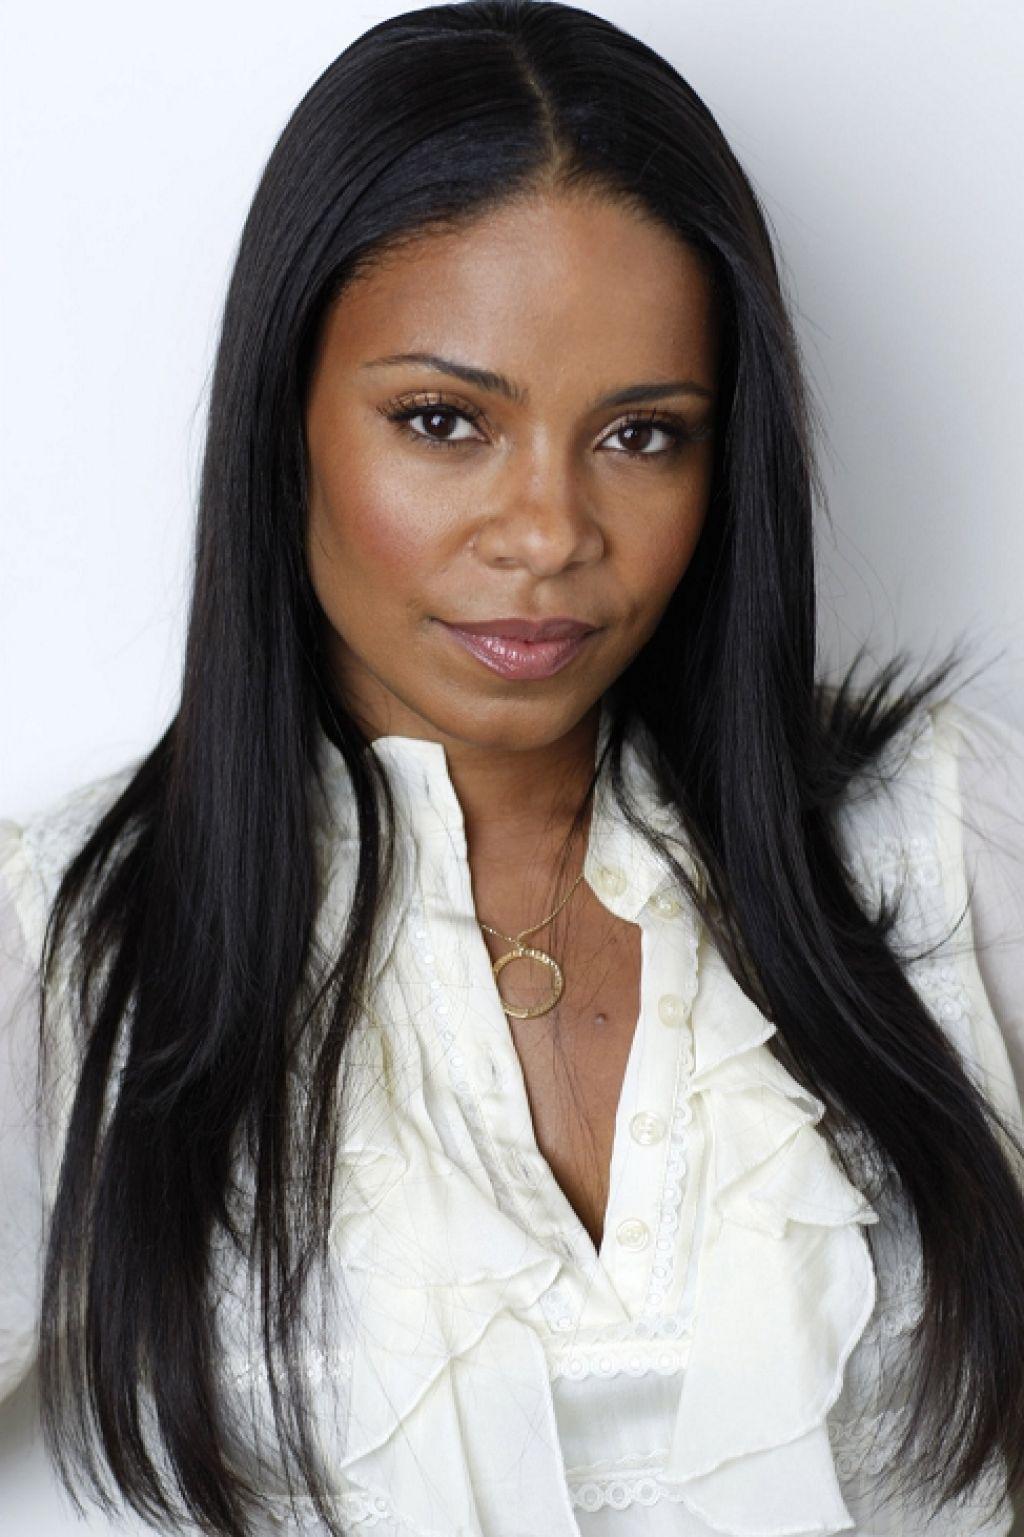 long weave hairstyles black women - new hairstyles trend long